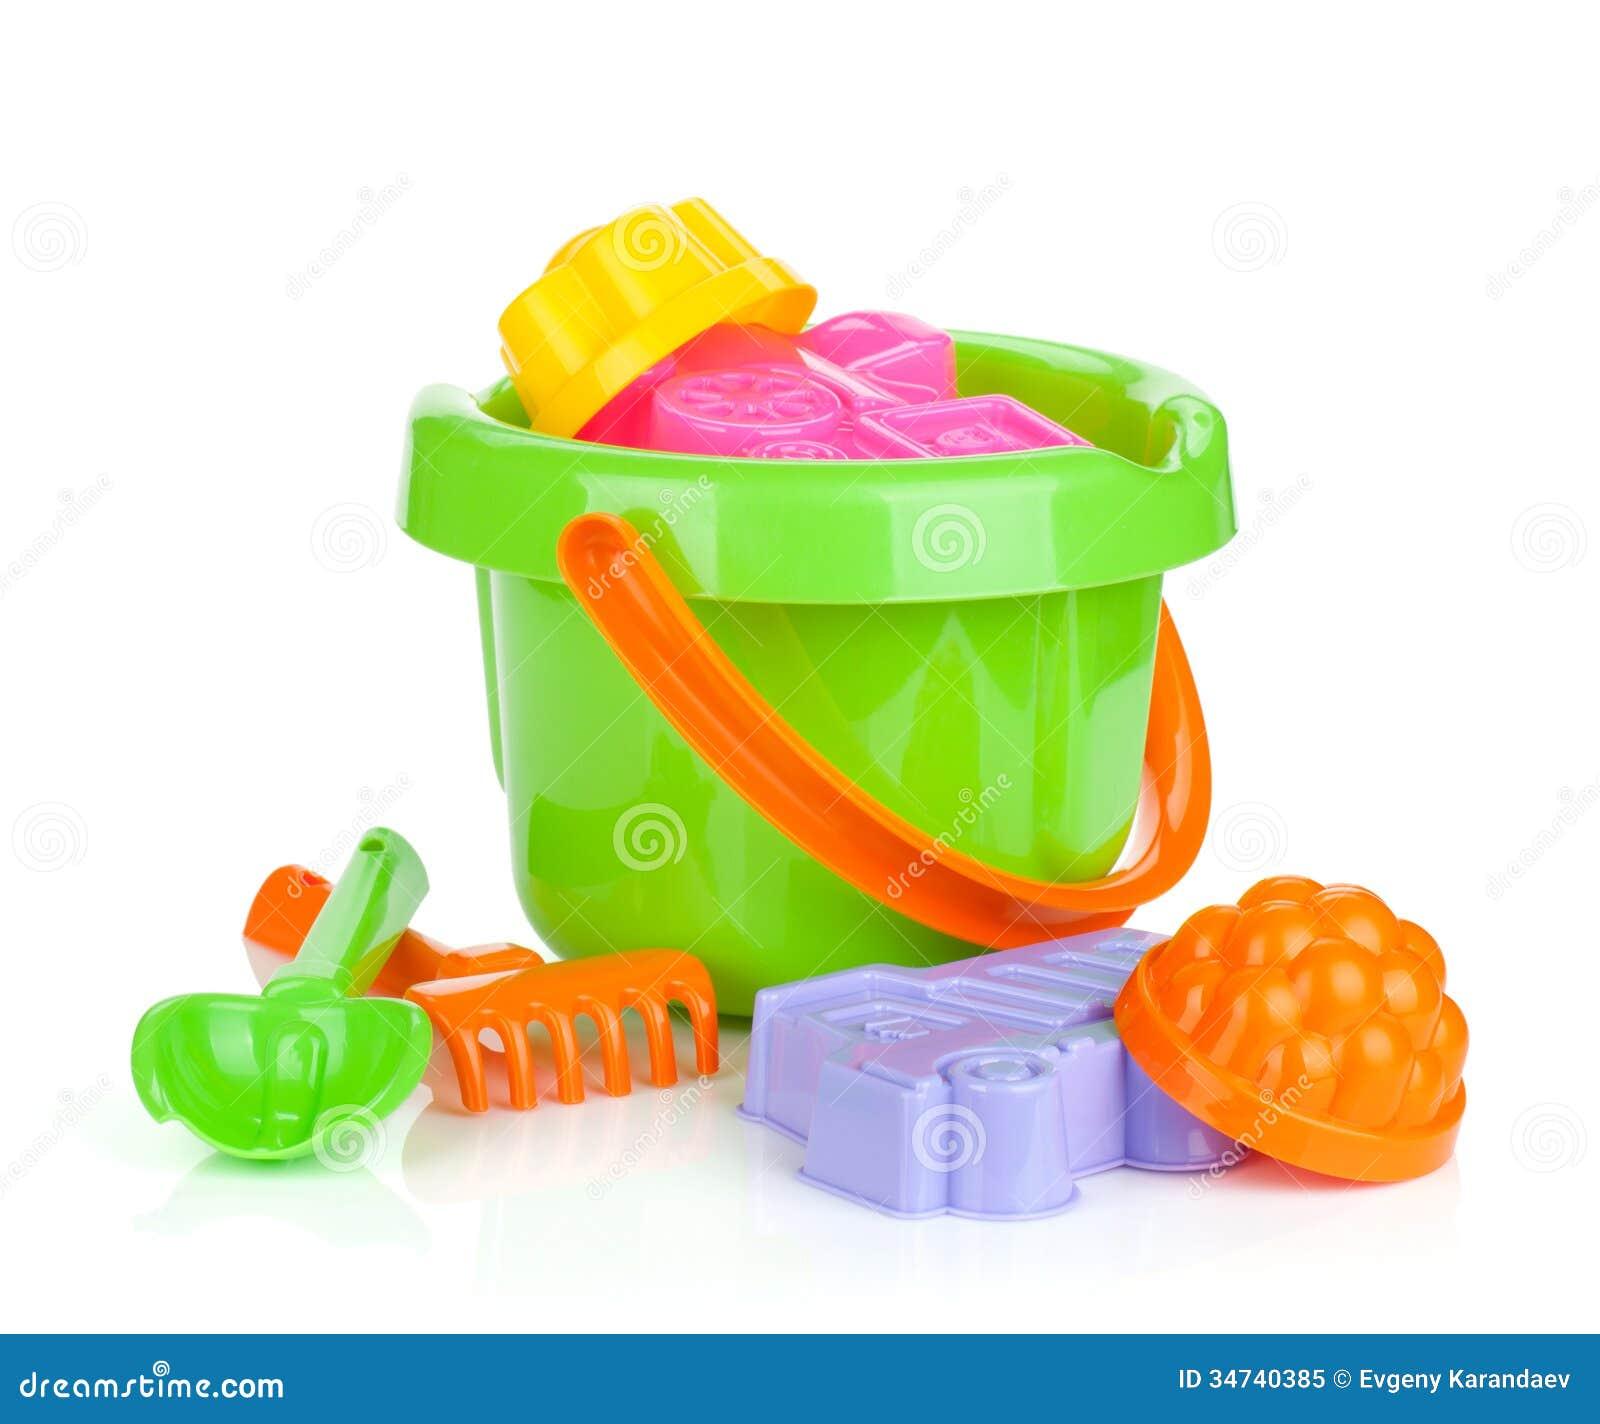 Toys For Beach : Baby beach sand toys royalty free stock photo image